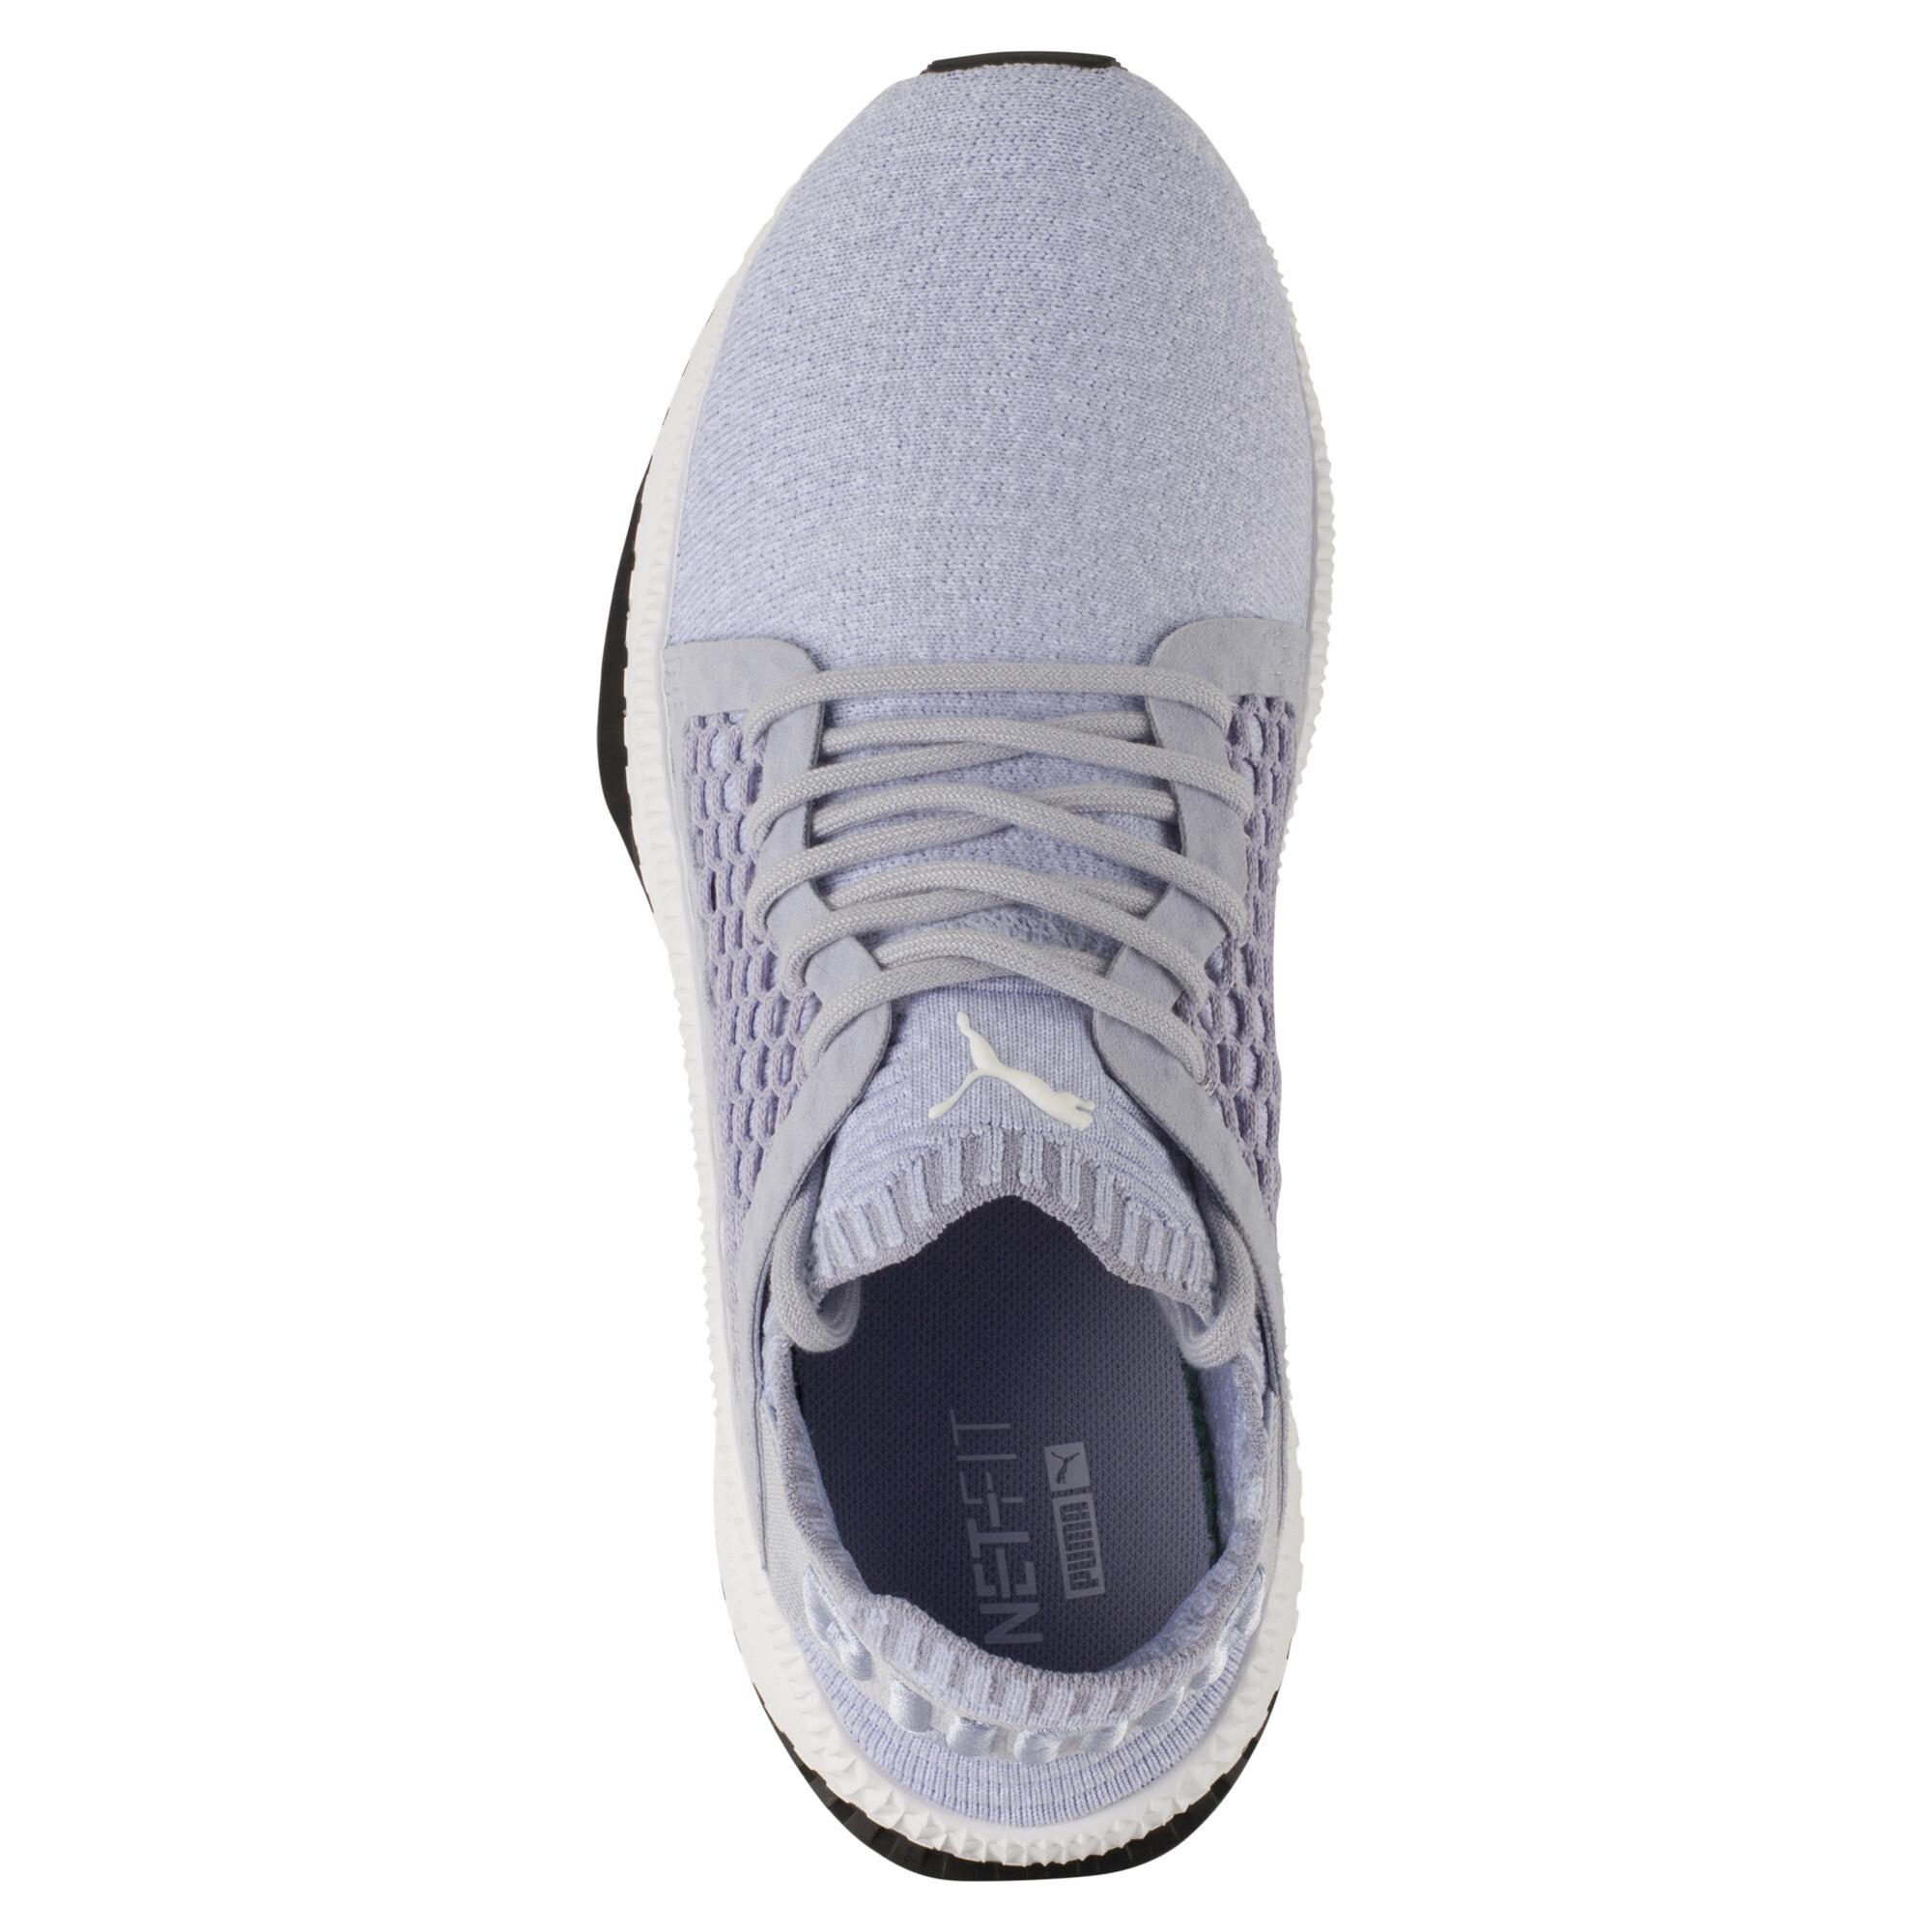 PUMA-TSUGI-NETFIT-evoKNIT-Sneaker-Frauen-Schuhe-Neu Indexbild 6